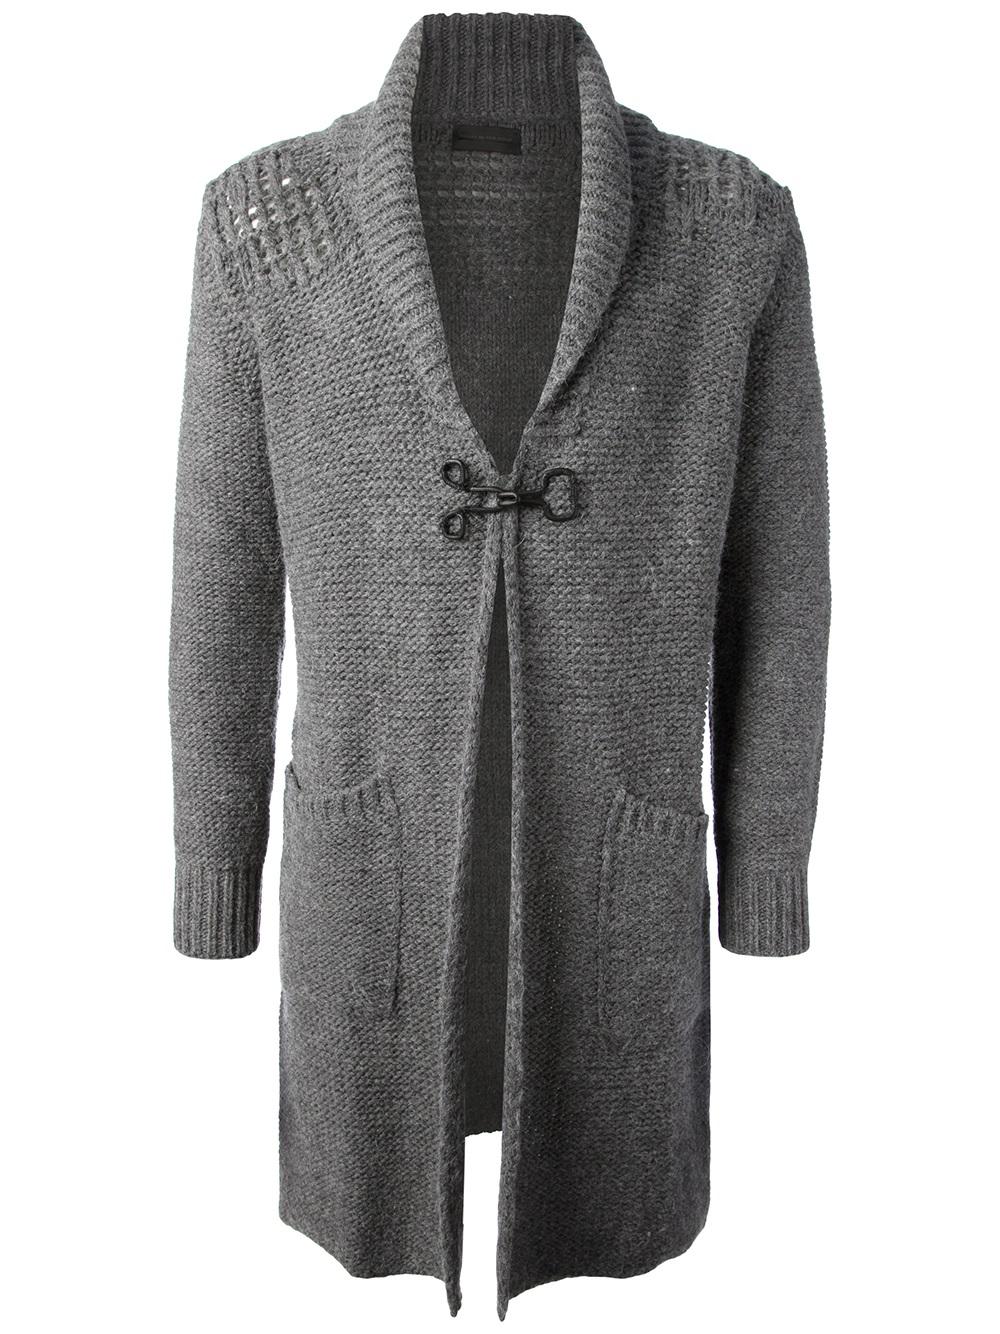 Diesel black gold Kiantony Cardigan in Gray for Men | Lyst